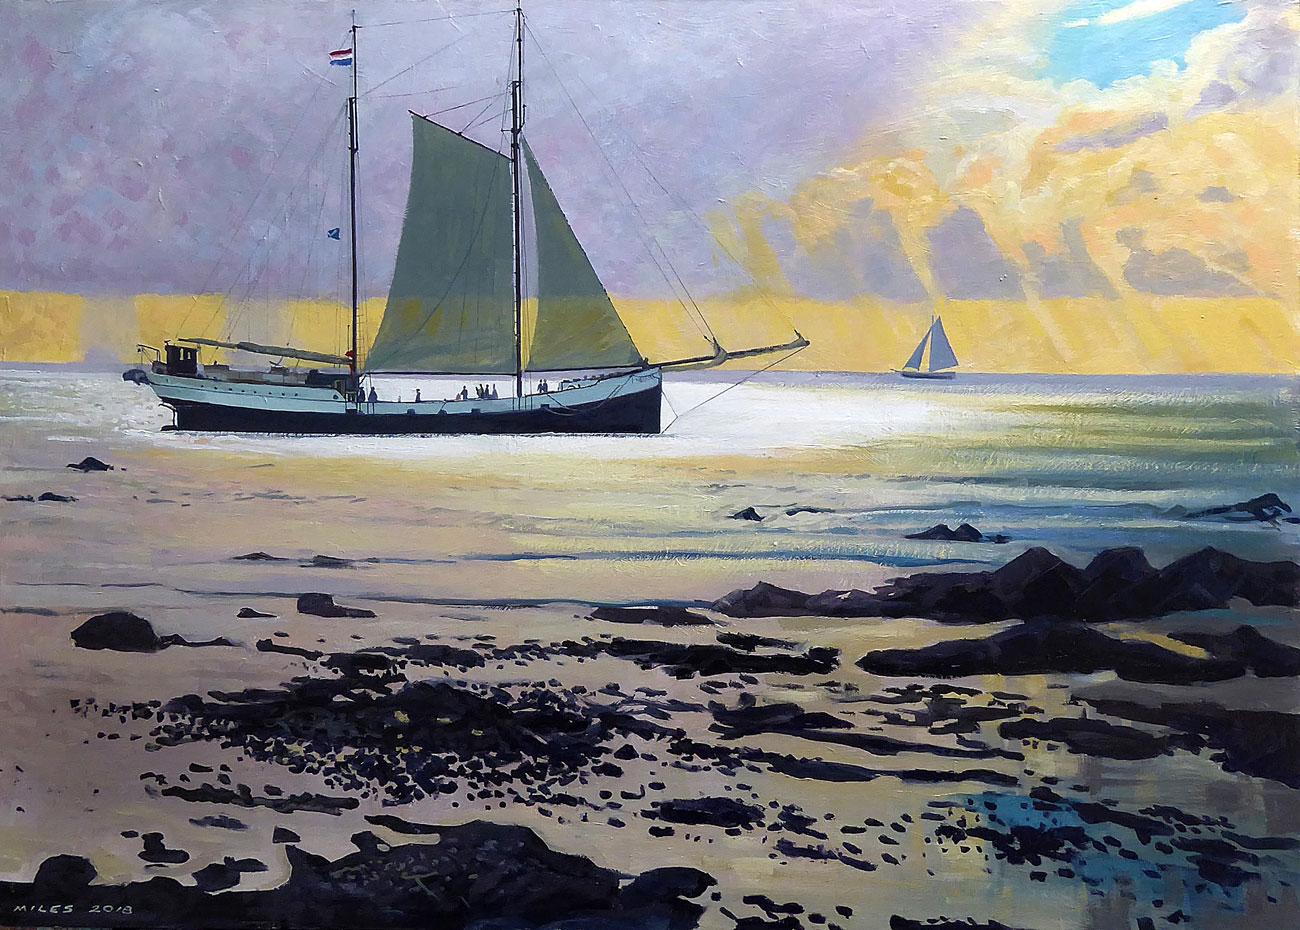 utch-andscape-Painting-Gerry-Miles.-Spotlight-on-Elegance.jpg